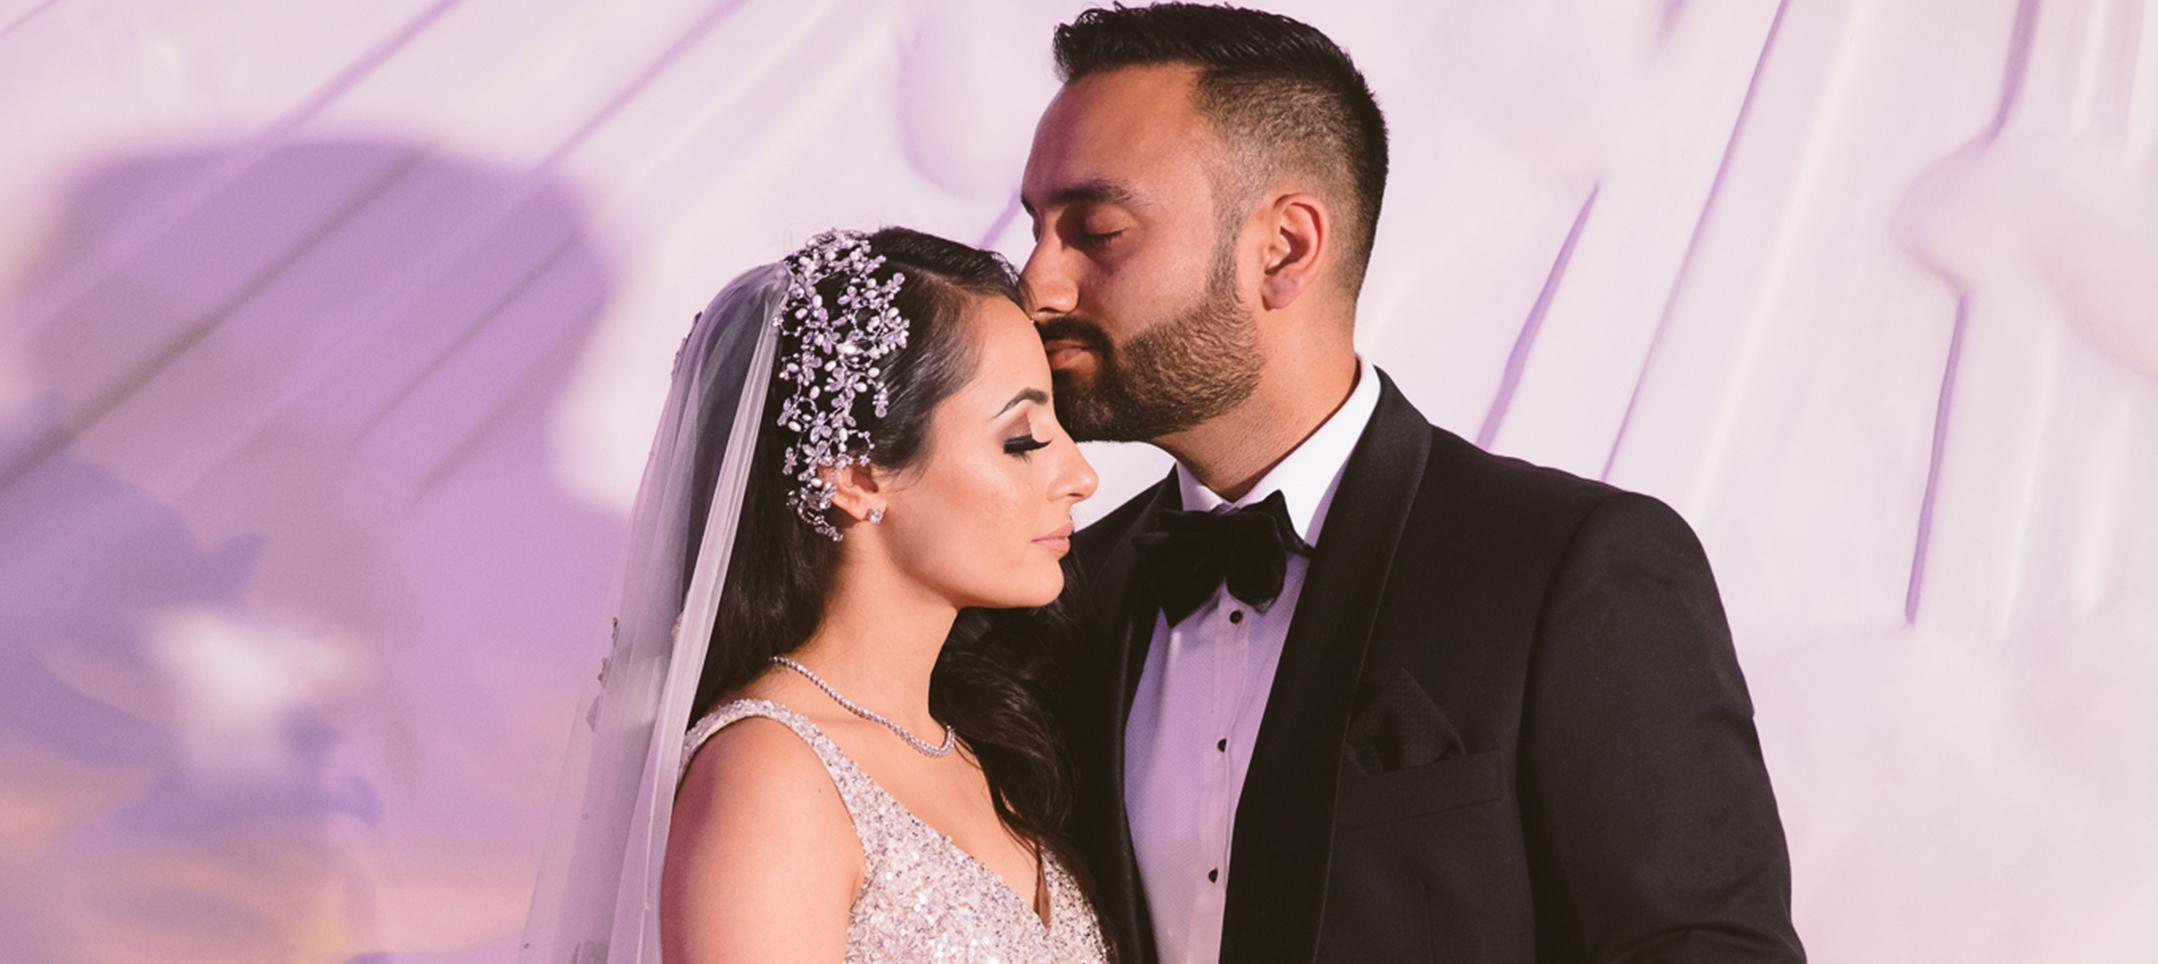 Zohaib Ali Wedding Photographer.jpg